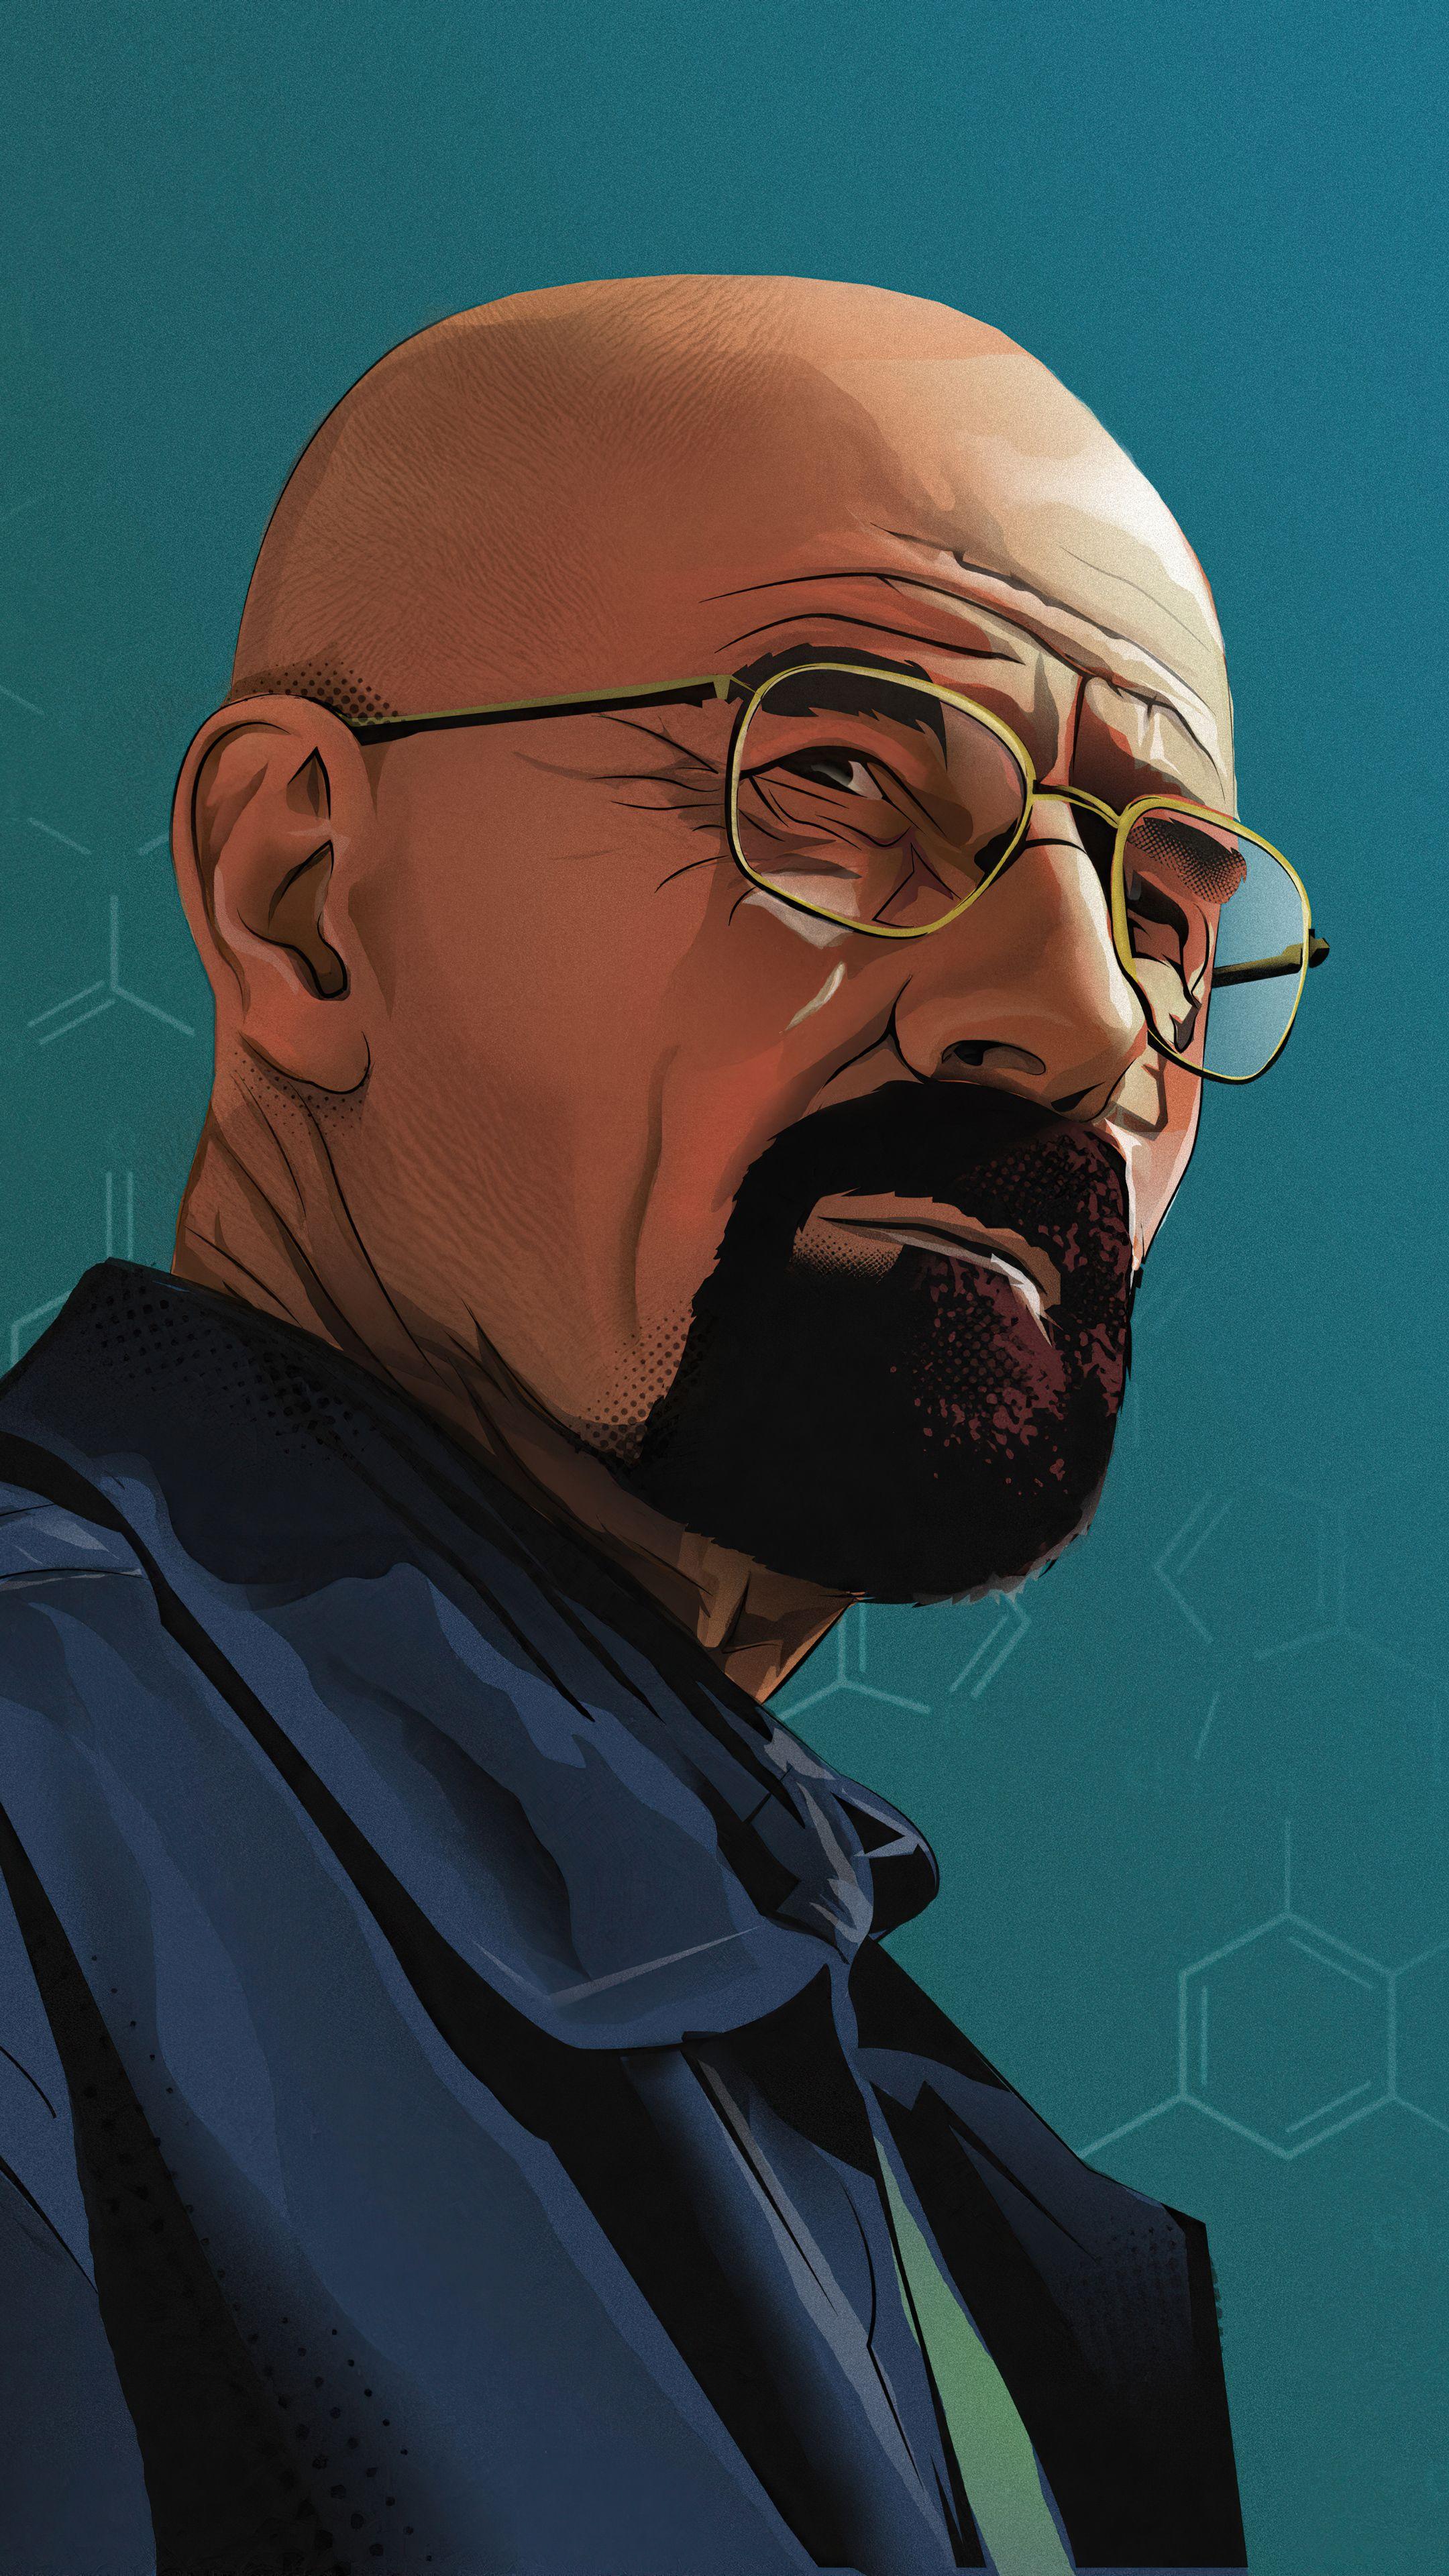 Walter White in Breaking Bad Mobile HD Wallpaper in 2020